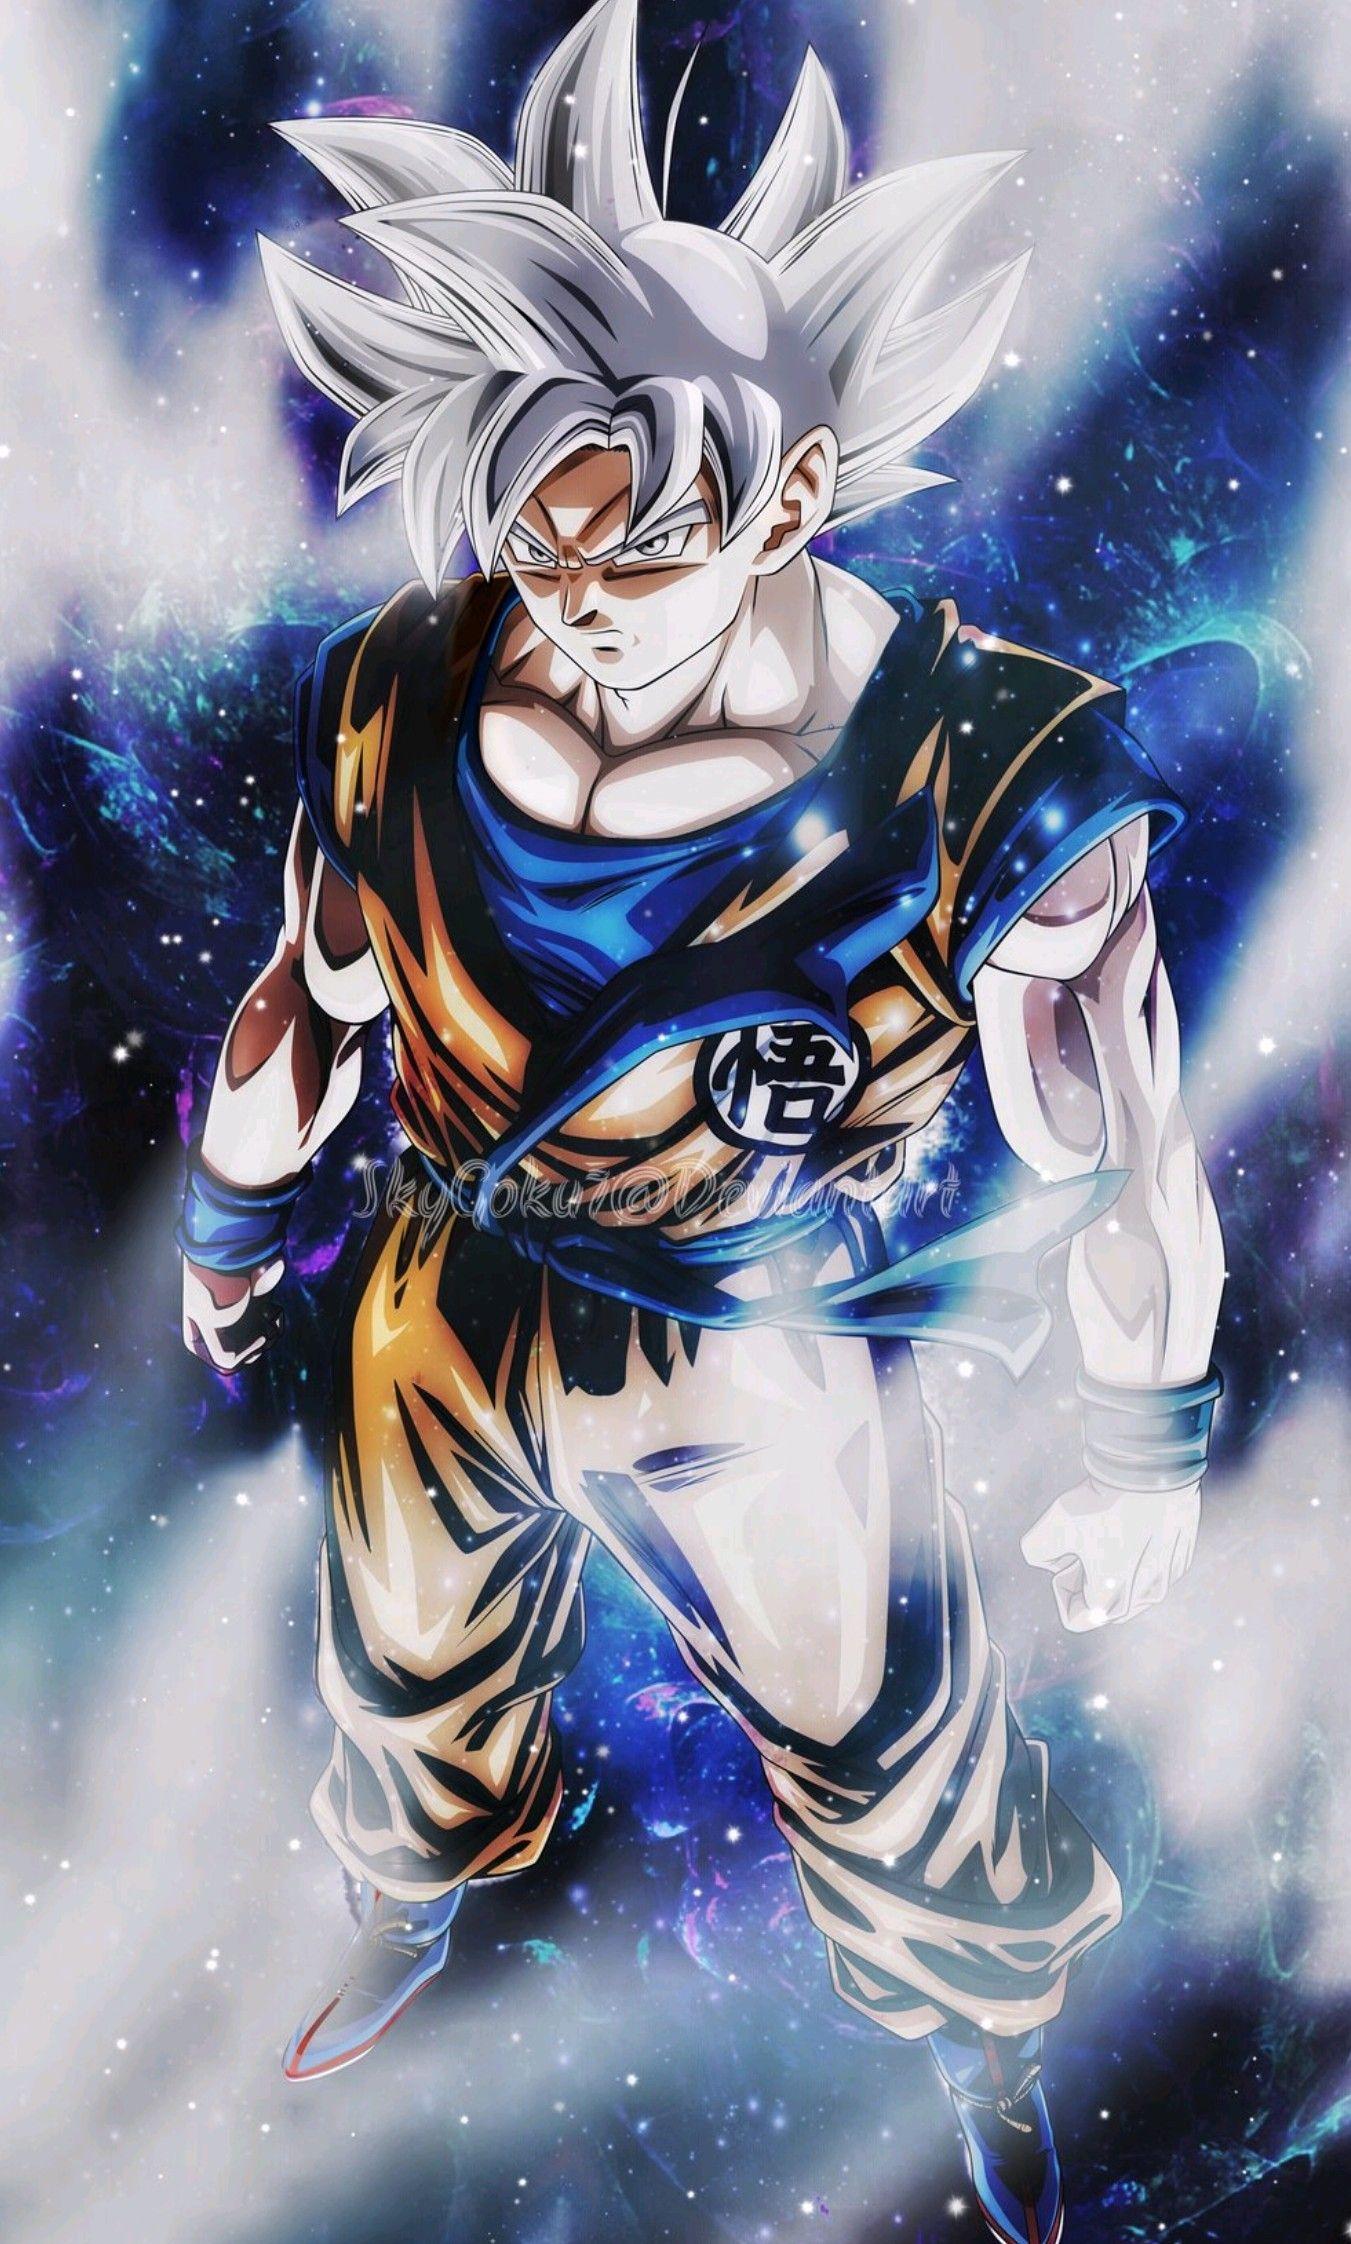 Goku Ultra Instinct Mobile Wallpapers Wallpaper Cave